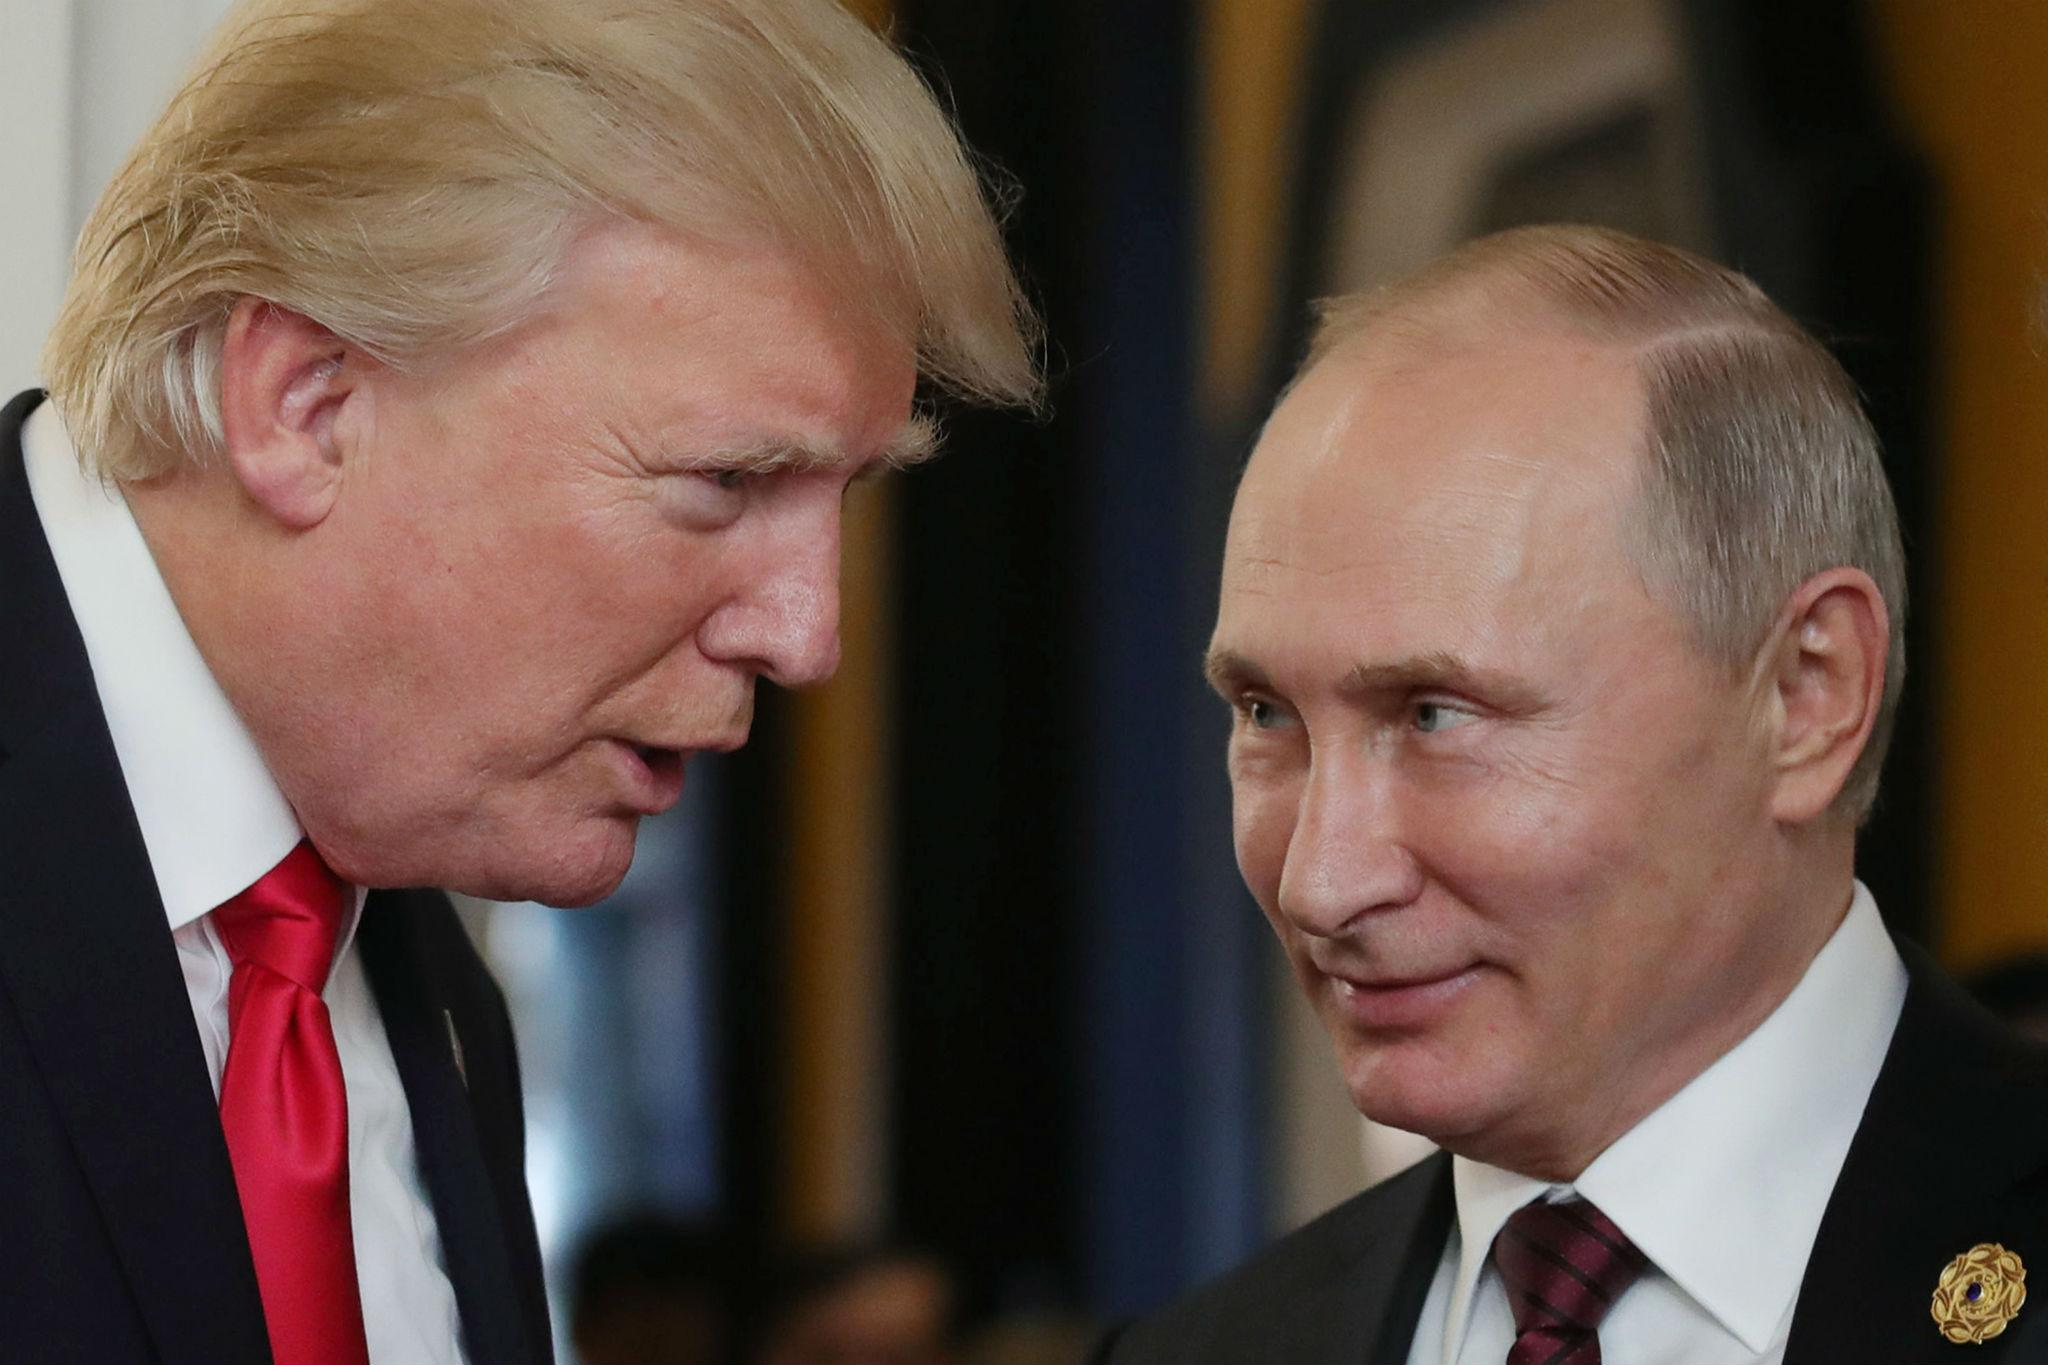 Trump and Putin discuss 'working together' on North Korea crisis